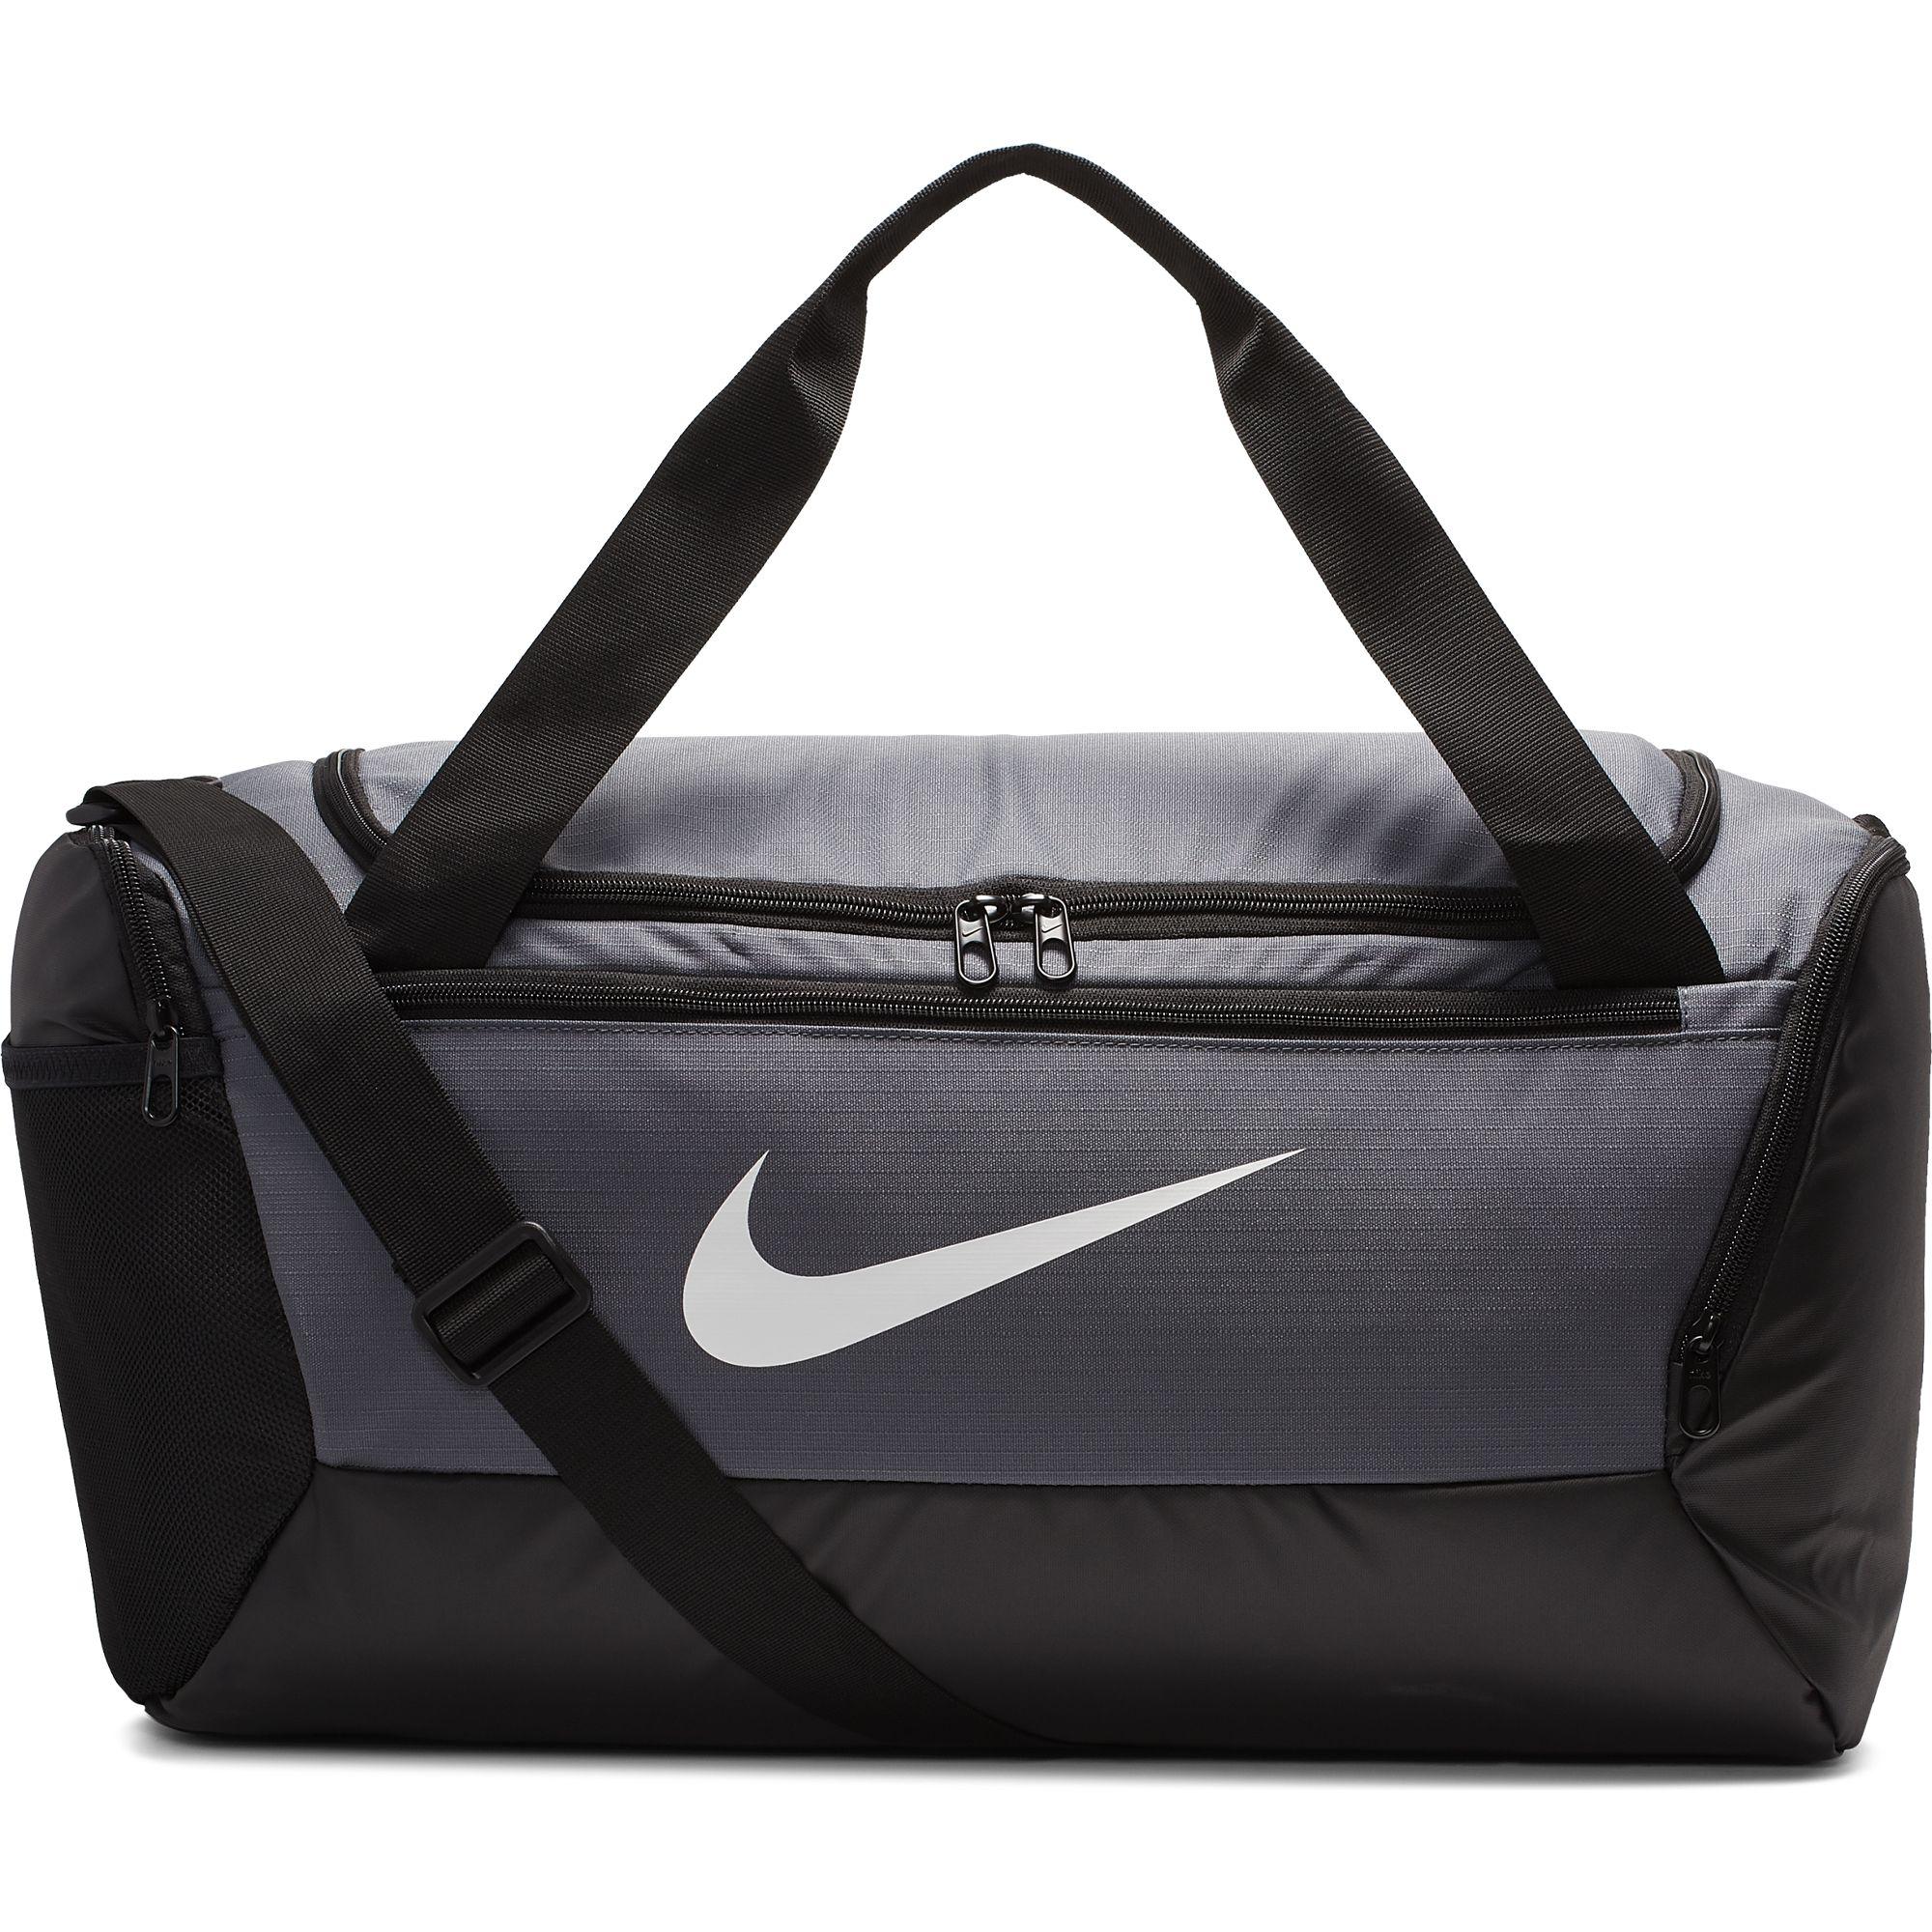 Brasilia Small Training Duffell Bag, Gray/Black, swatch